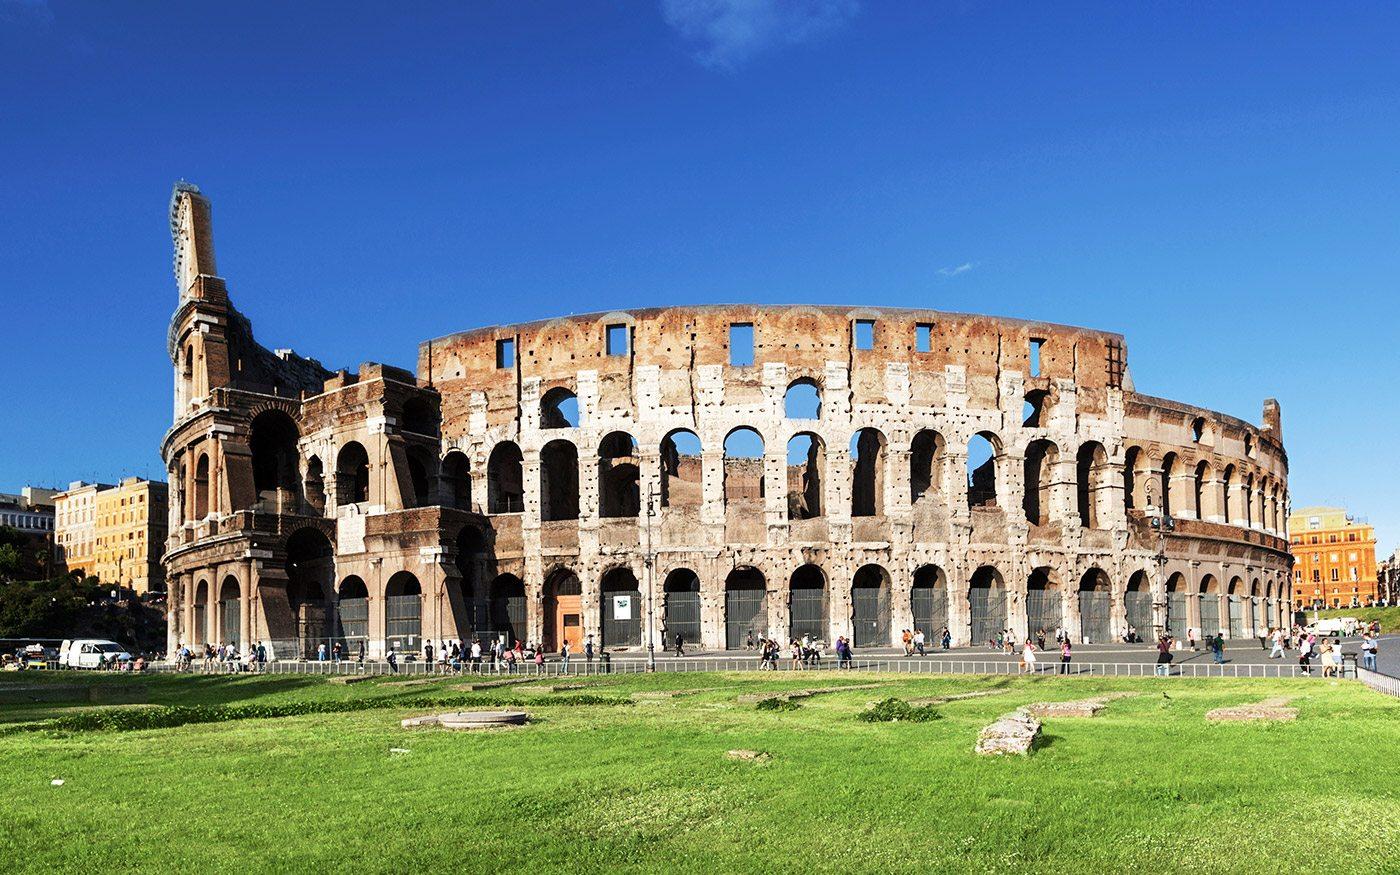 de-viaje-por-europa:-ciudades-que-no-debes-perderte